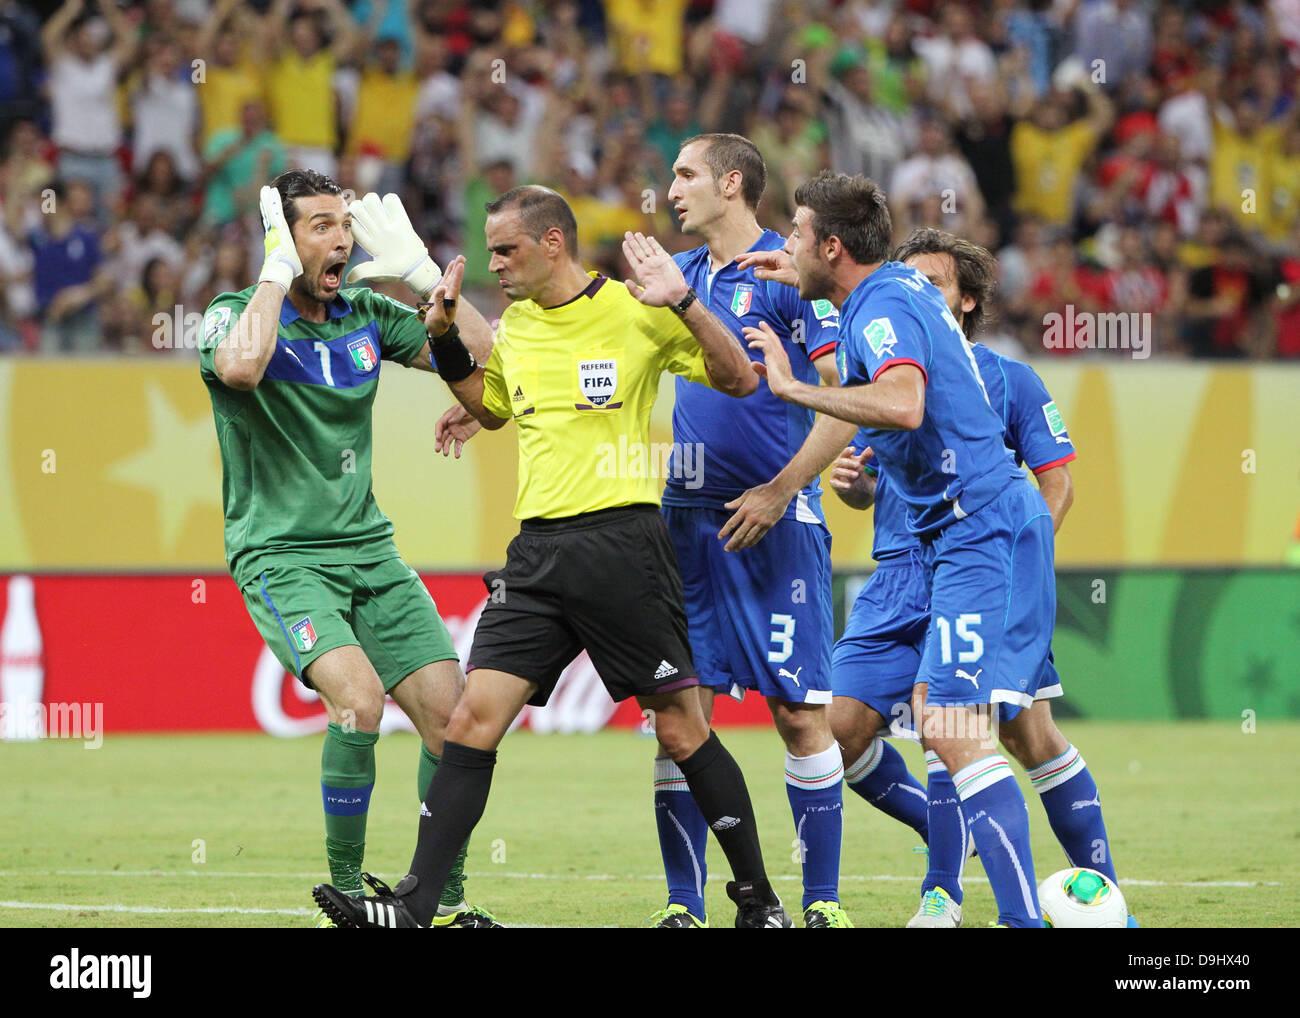 Gianluigi Buffon (ITA), 19. Juni 2013 - Fußball / Fußball: Gianluigi Buffon Italiens Proteste um Schiedsrichter Stockfoto